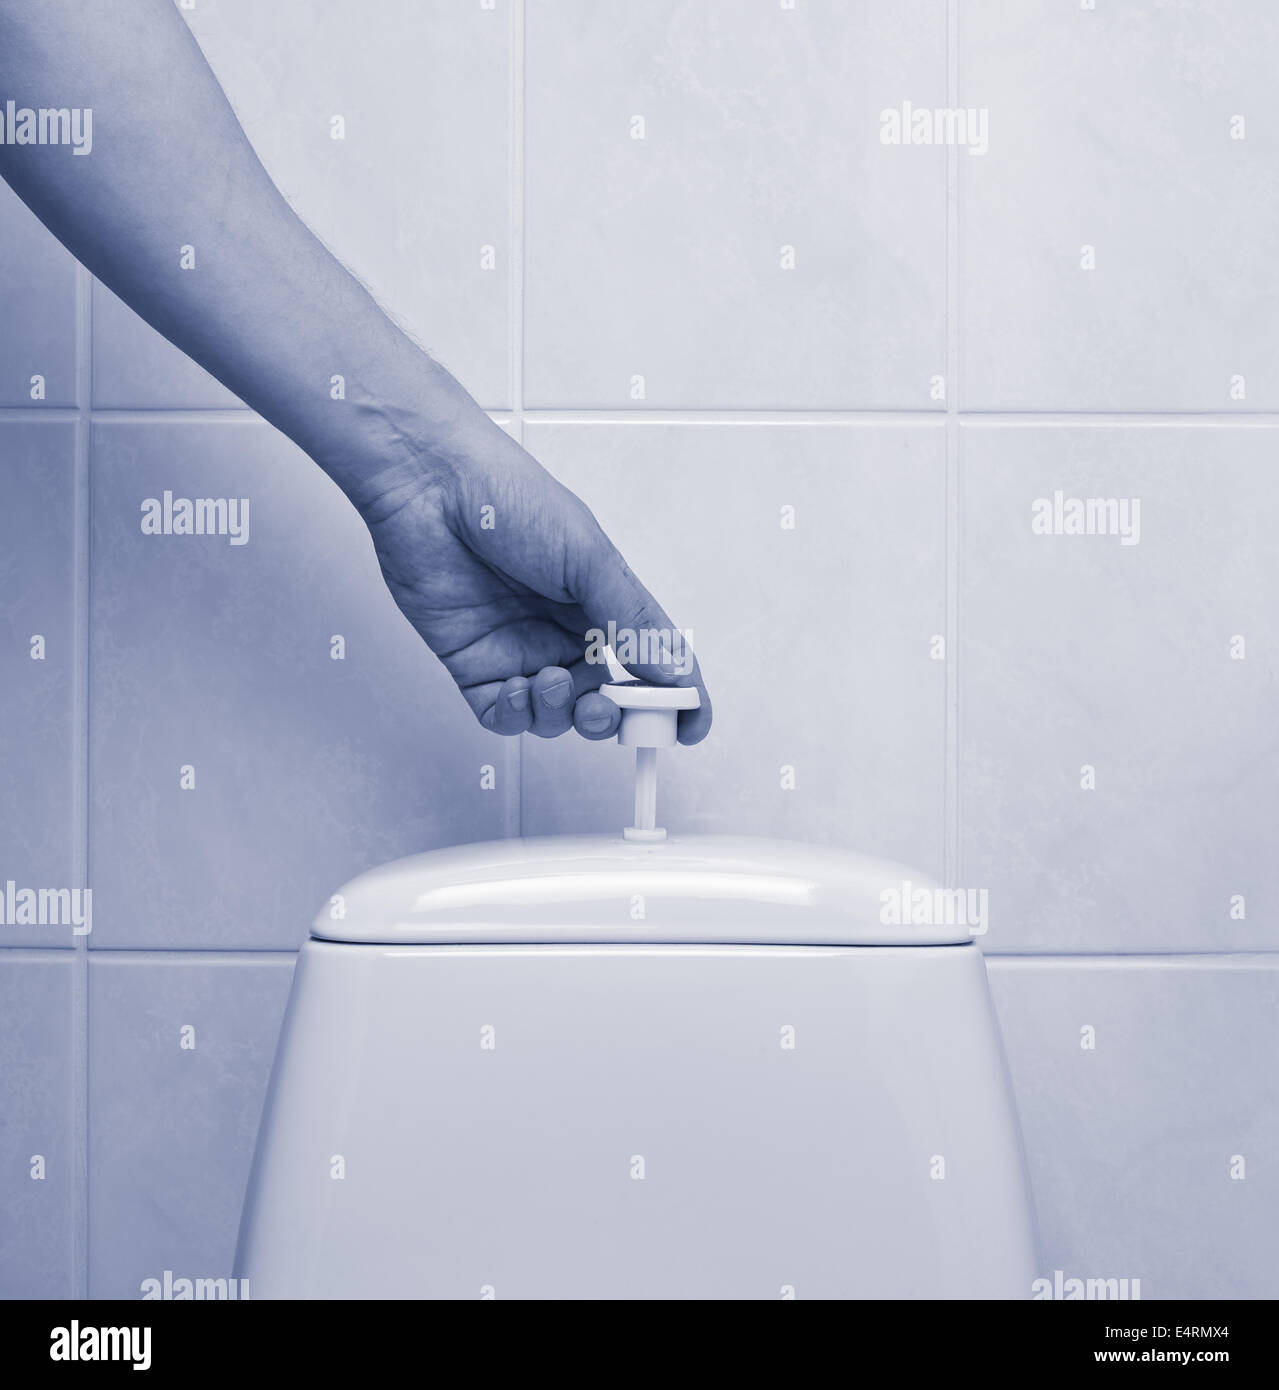 Bathroom Tiles Close Up Stock Photos Amp Bathroom Tiles